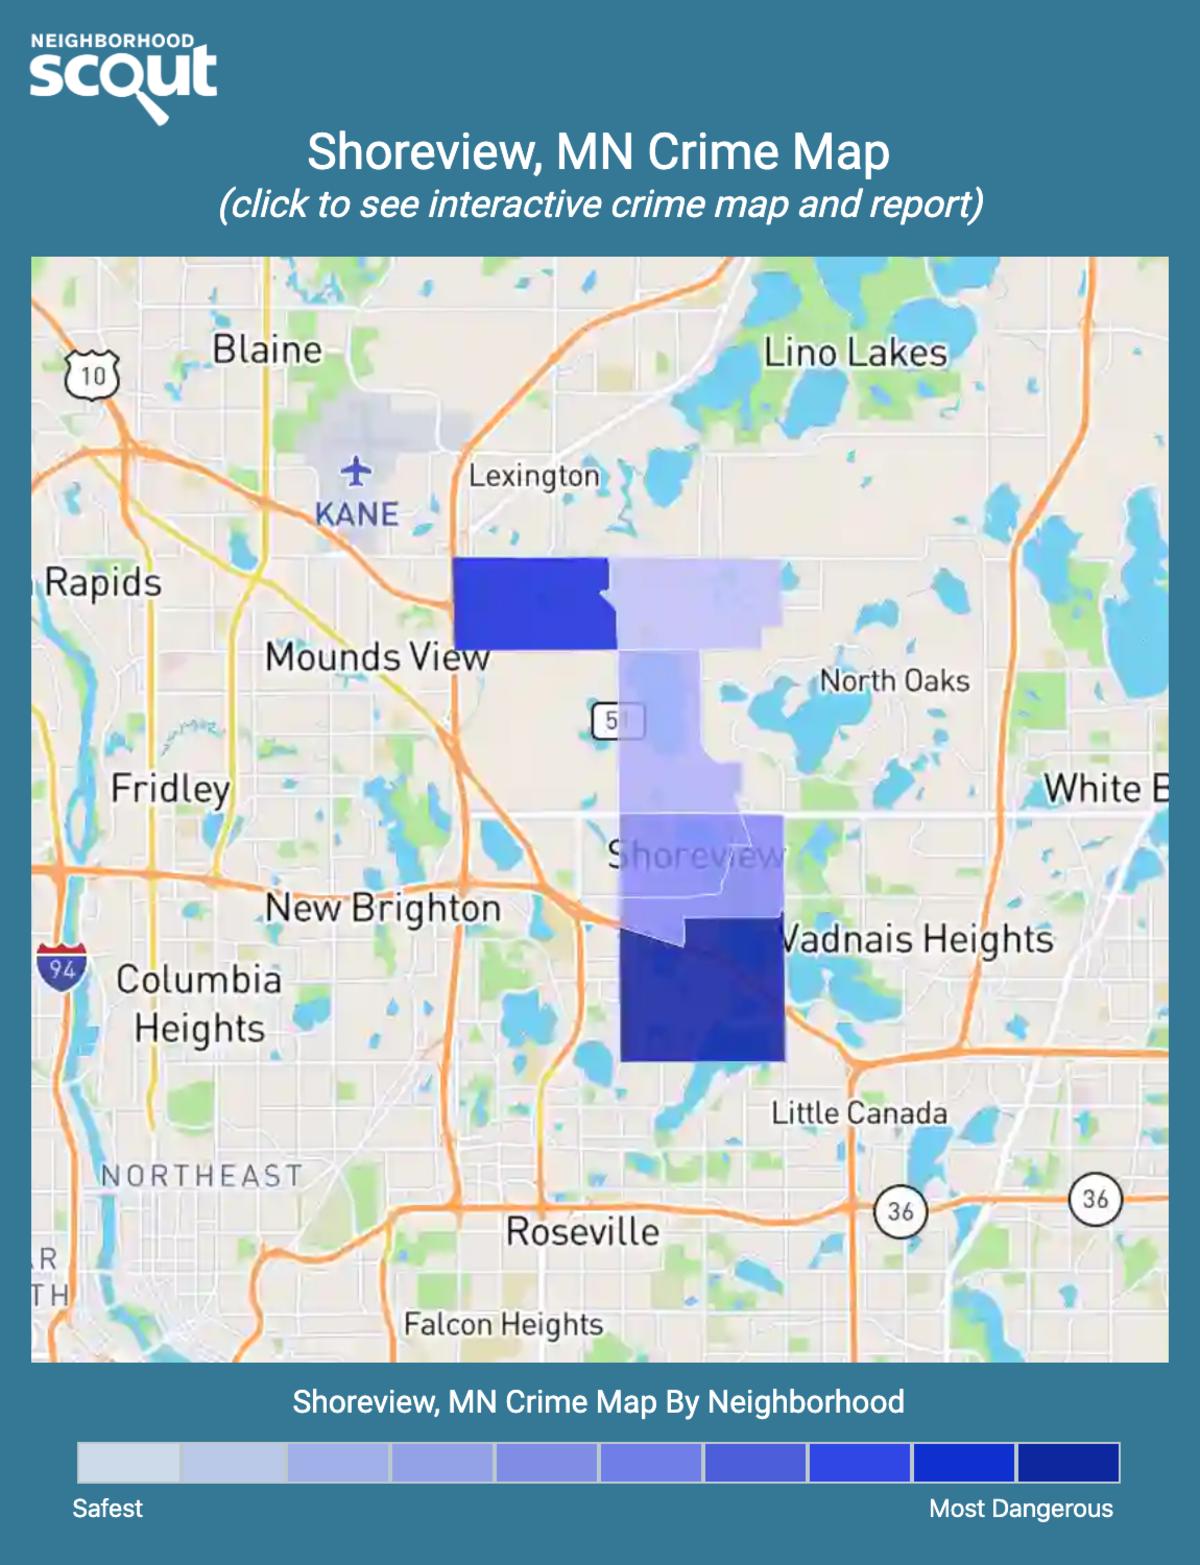 Shoreview, Minnesota crime map